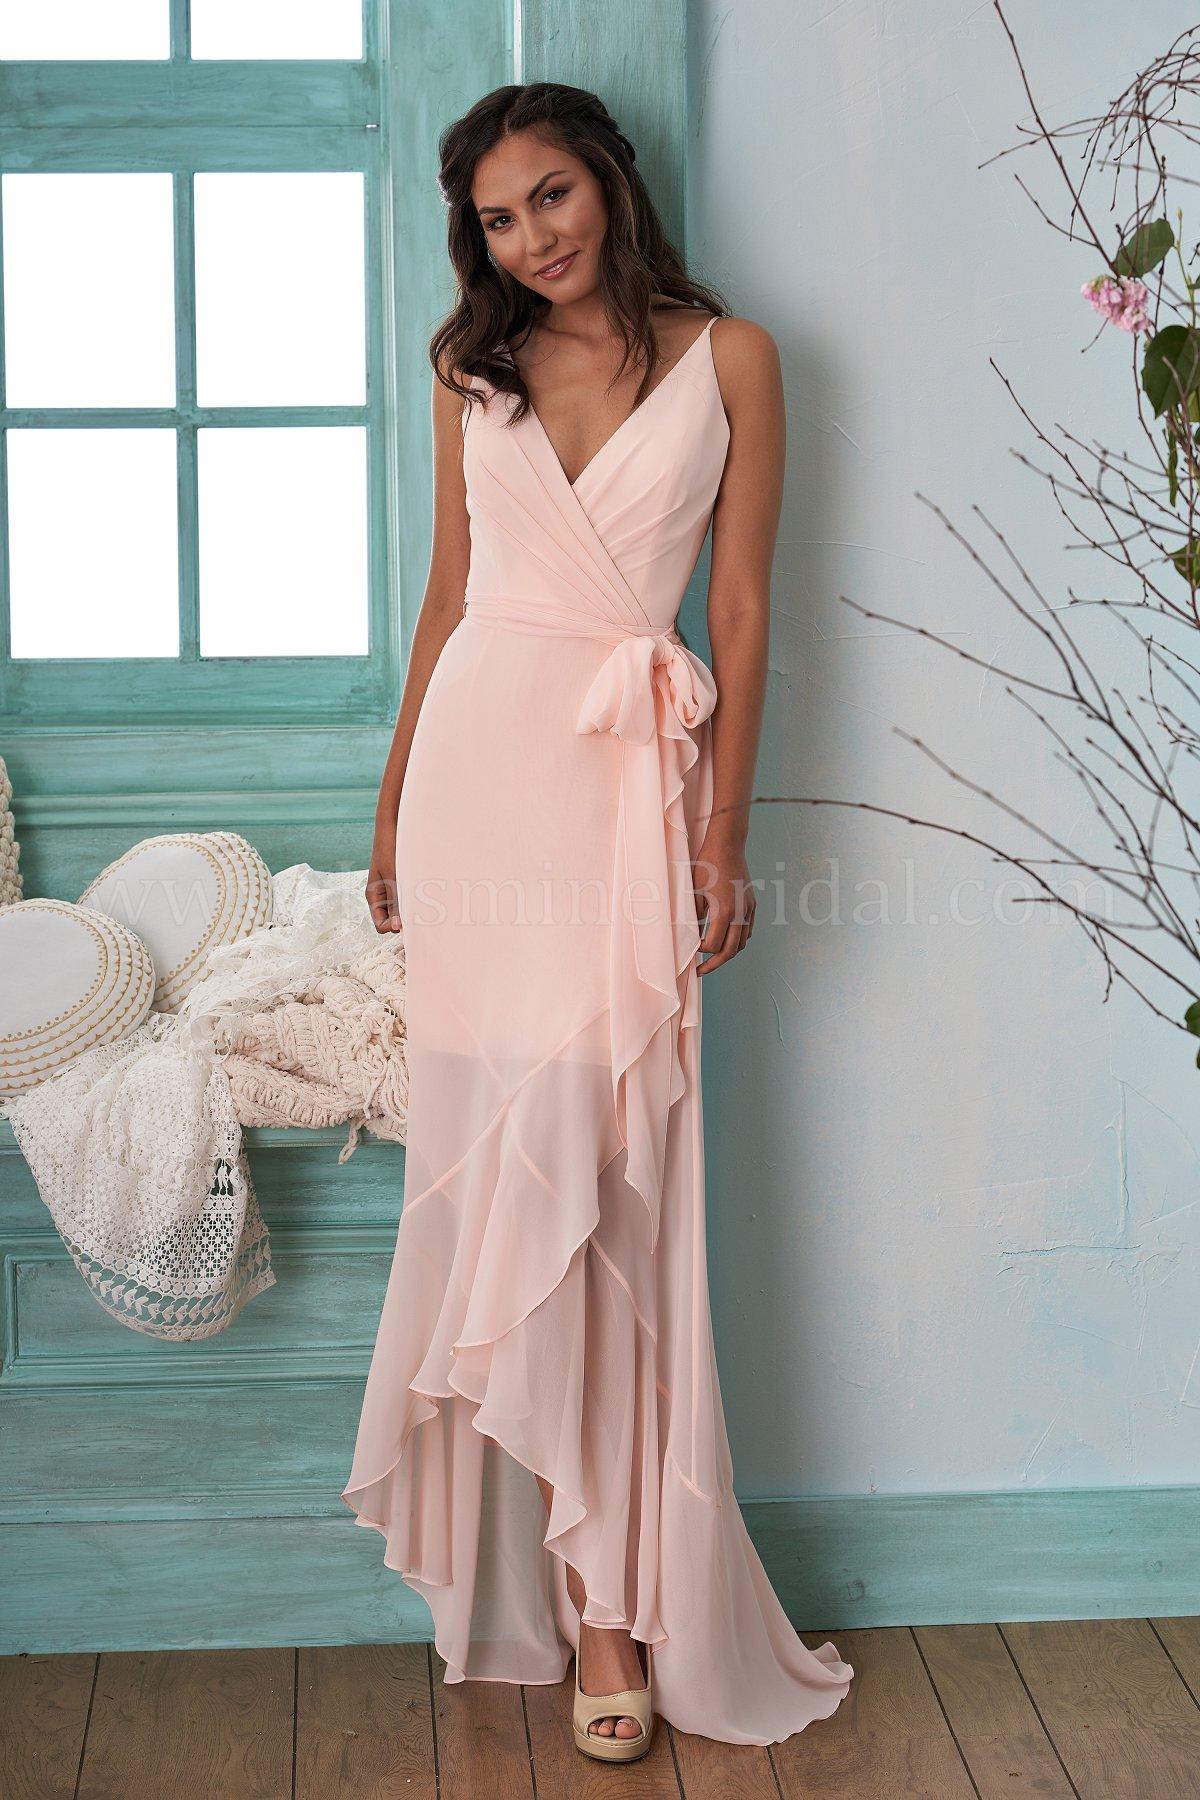 Bridal Bridesmaid Dresses